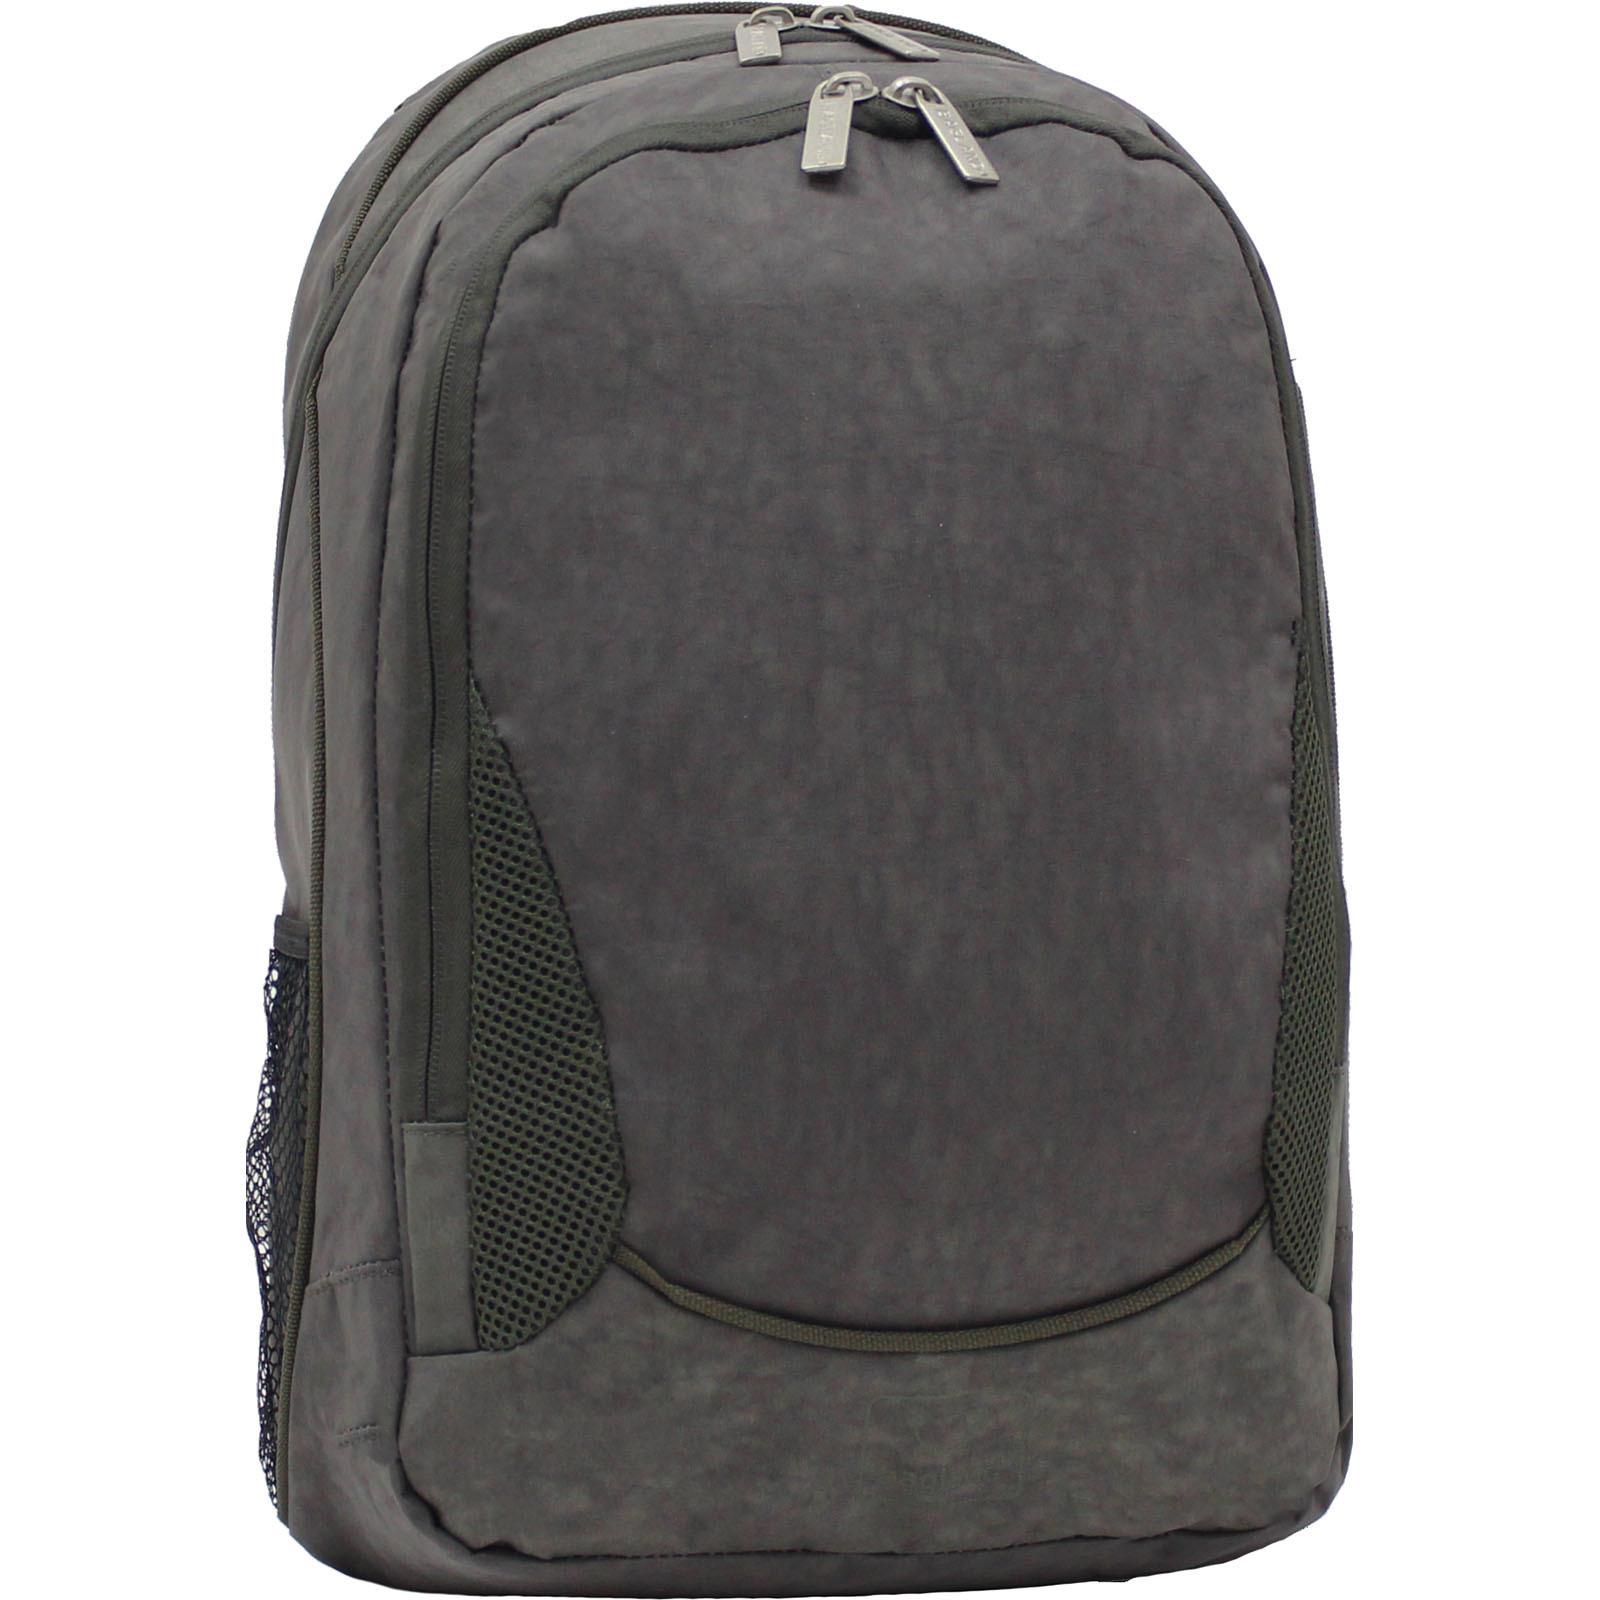 Городские рюкзаки Рюкзак Bagland Ураган 20 л. хаки (0057470) IMG_1293.JPG